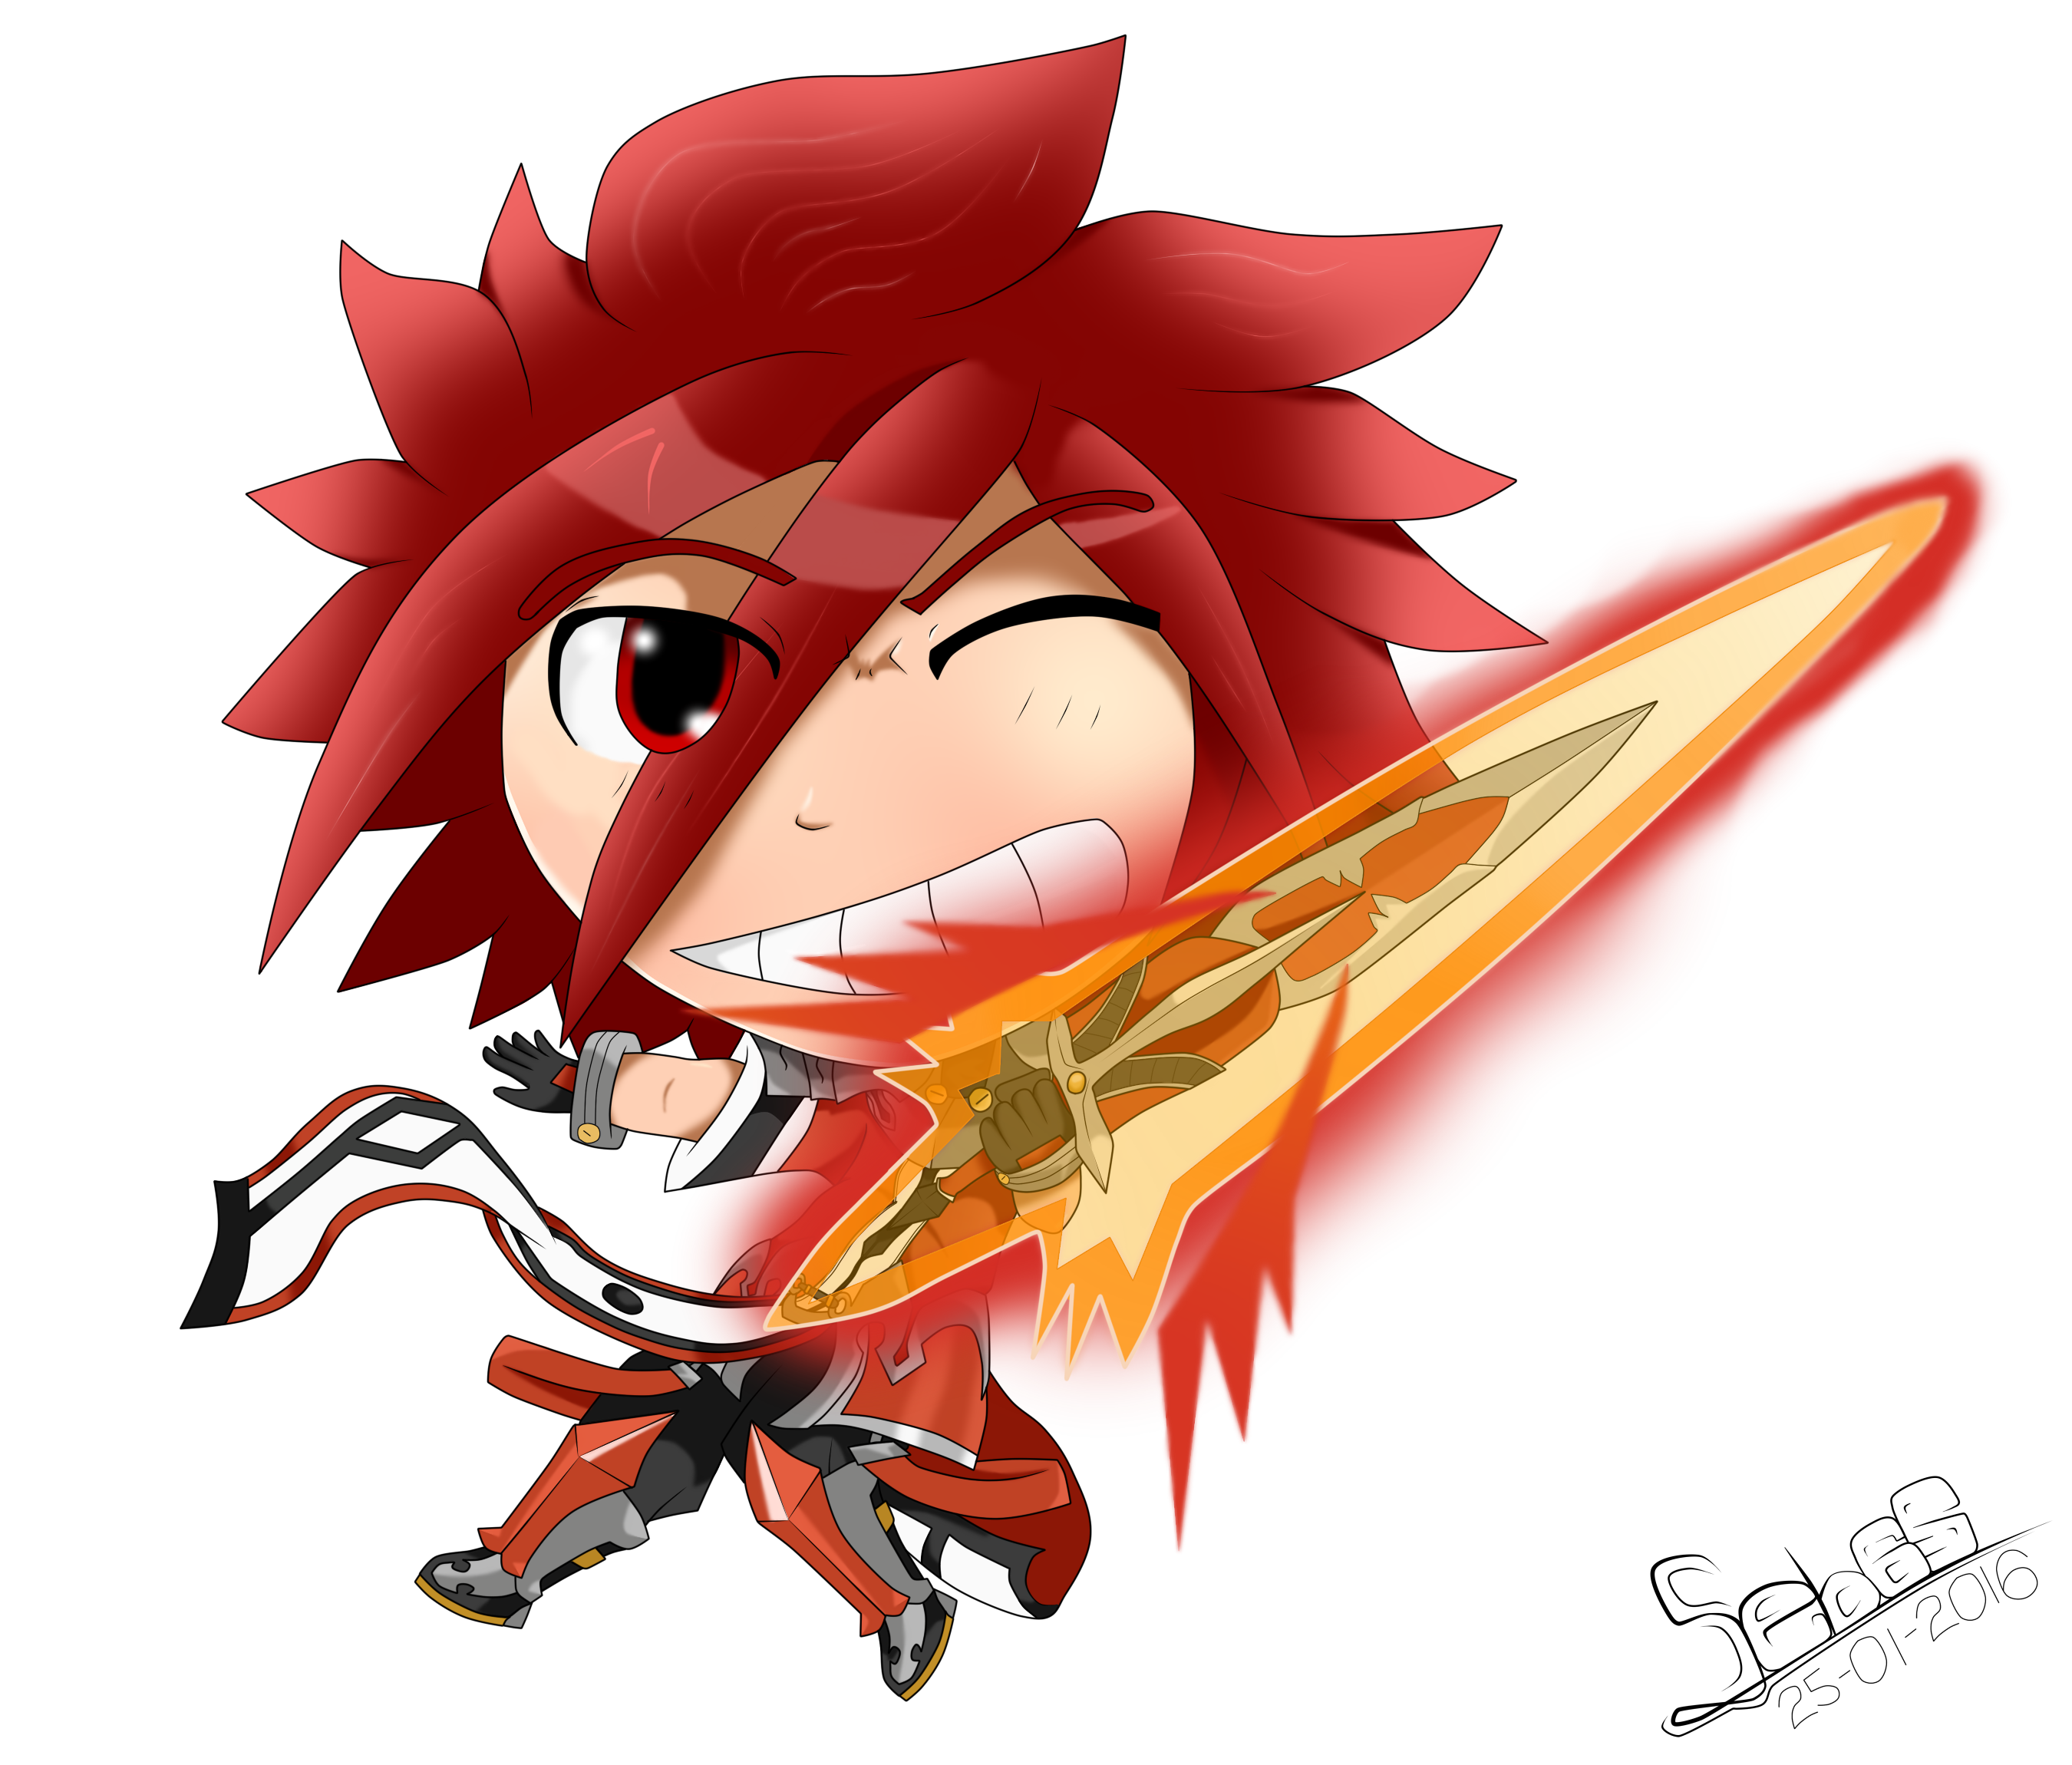 LordKnight-Chibi Armaggedon Blade by Seb-LK-585